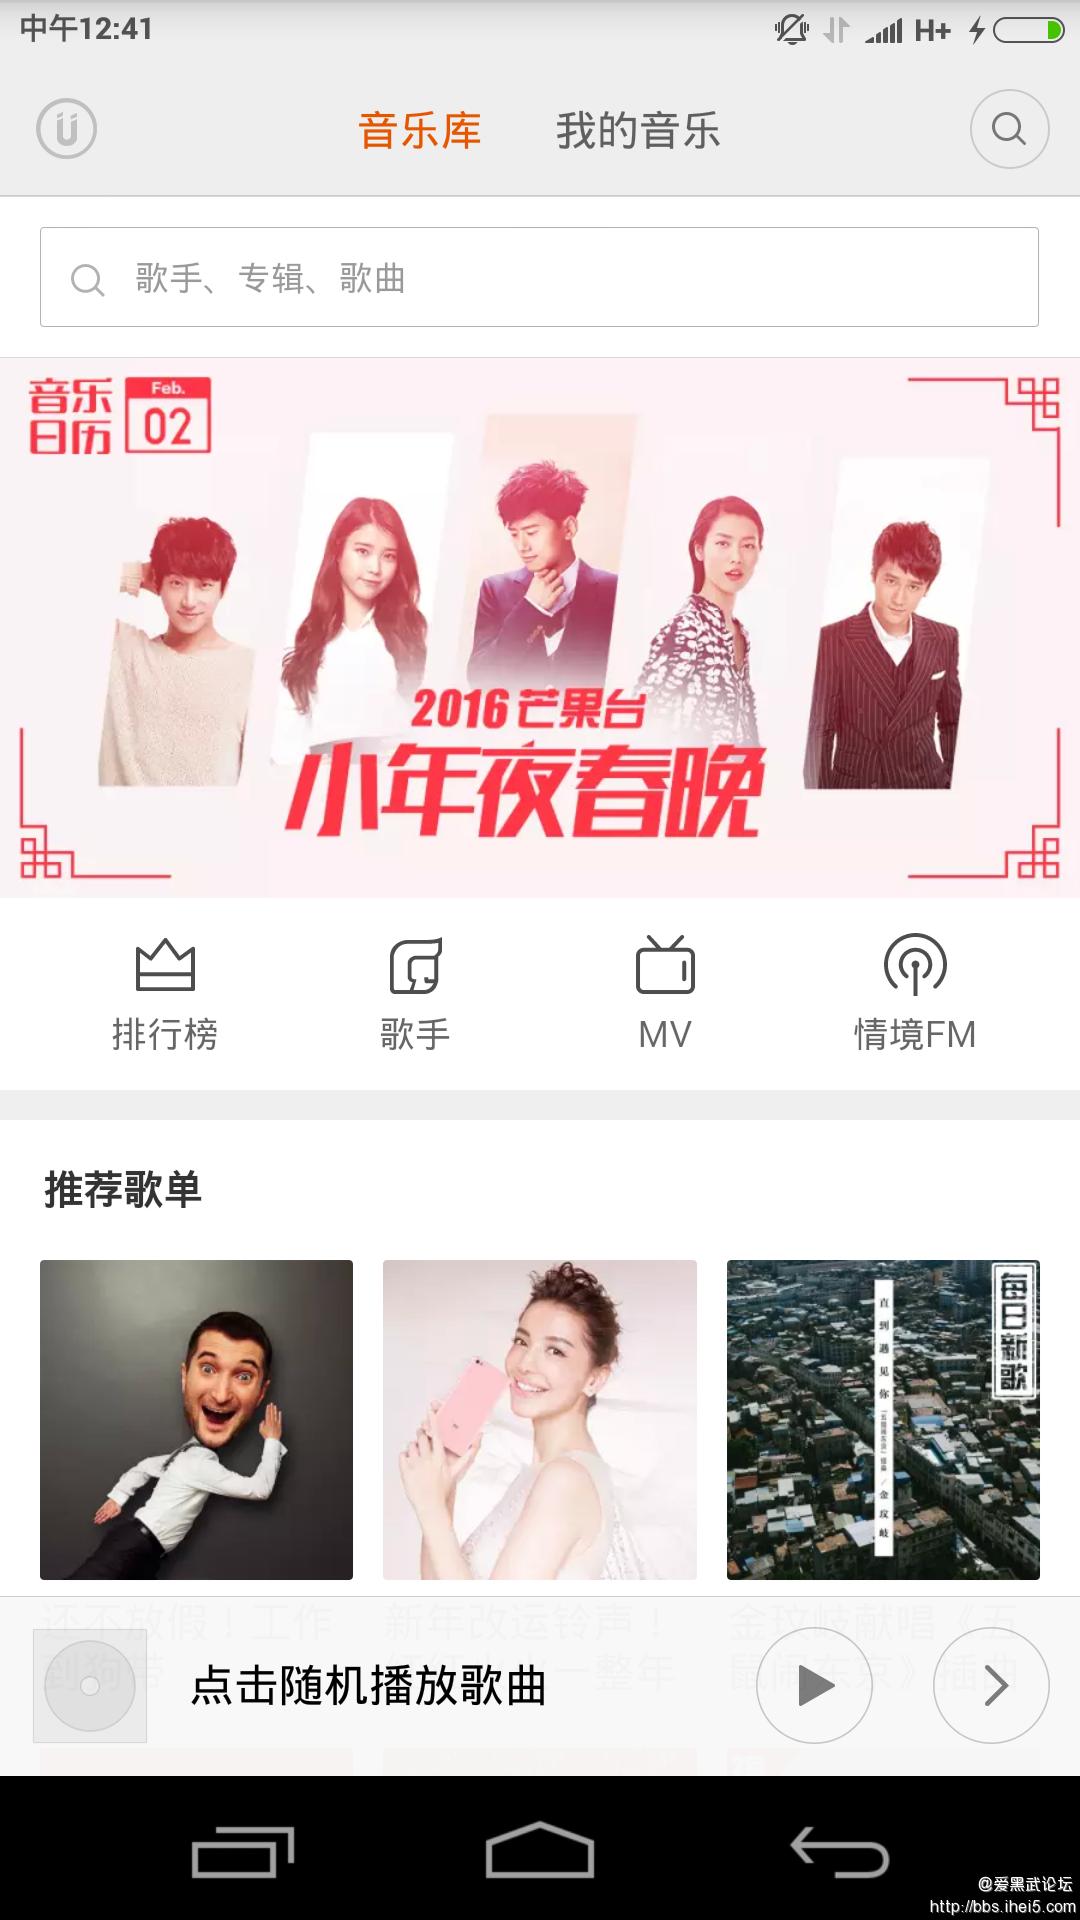 Screenshot_2016-02-02-12-41-28_com.miui.player.png